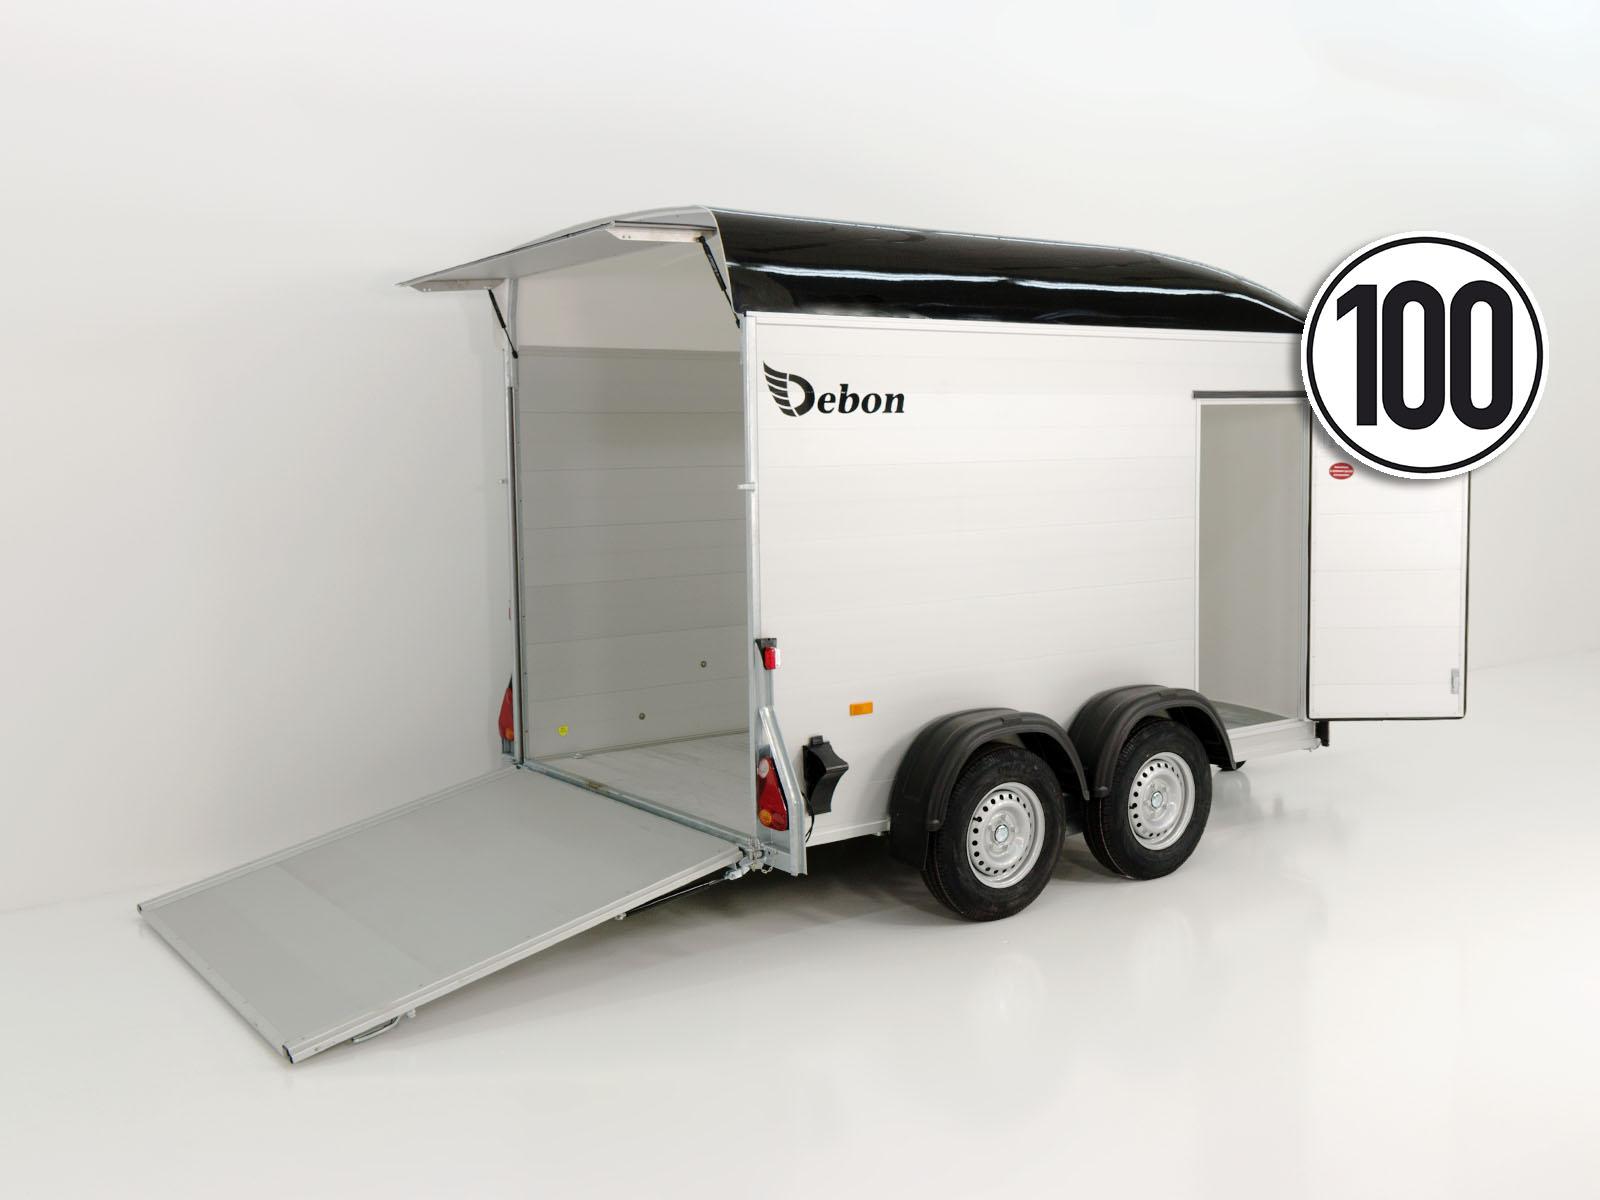 kofferanh nger cargo aluminium mit polybug 2 6t. Black Bedroom Furniture Sets. Home Design Ideas